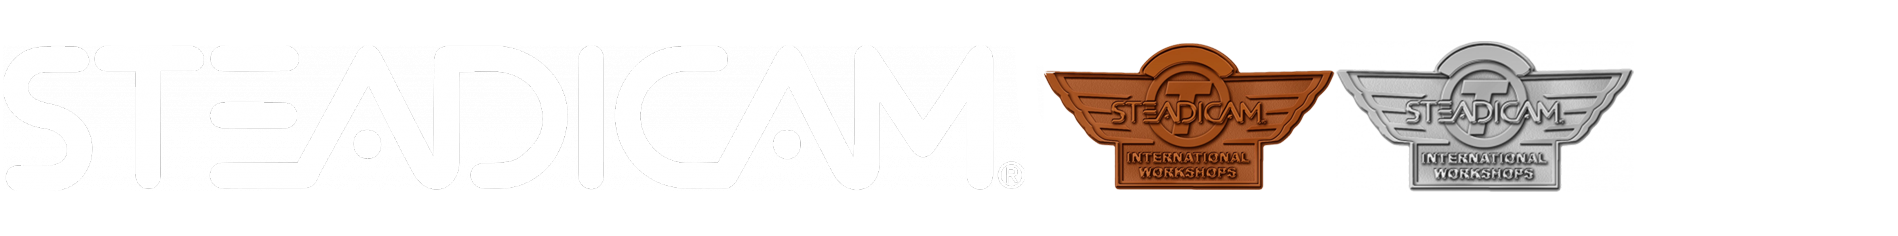 steadicam-logos1